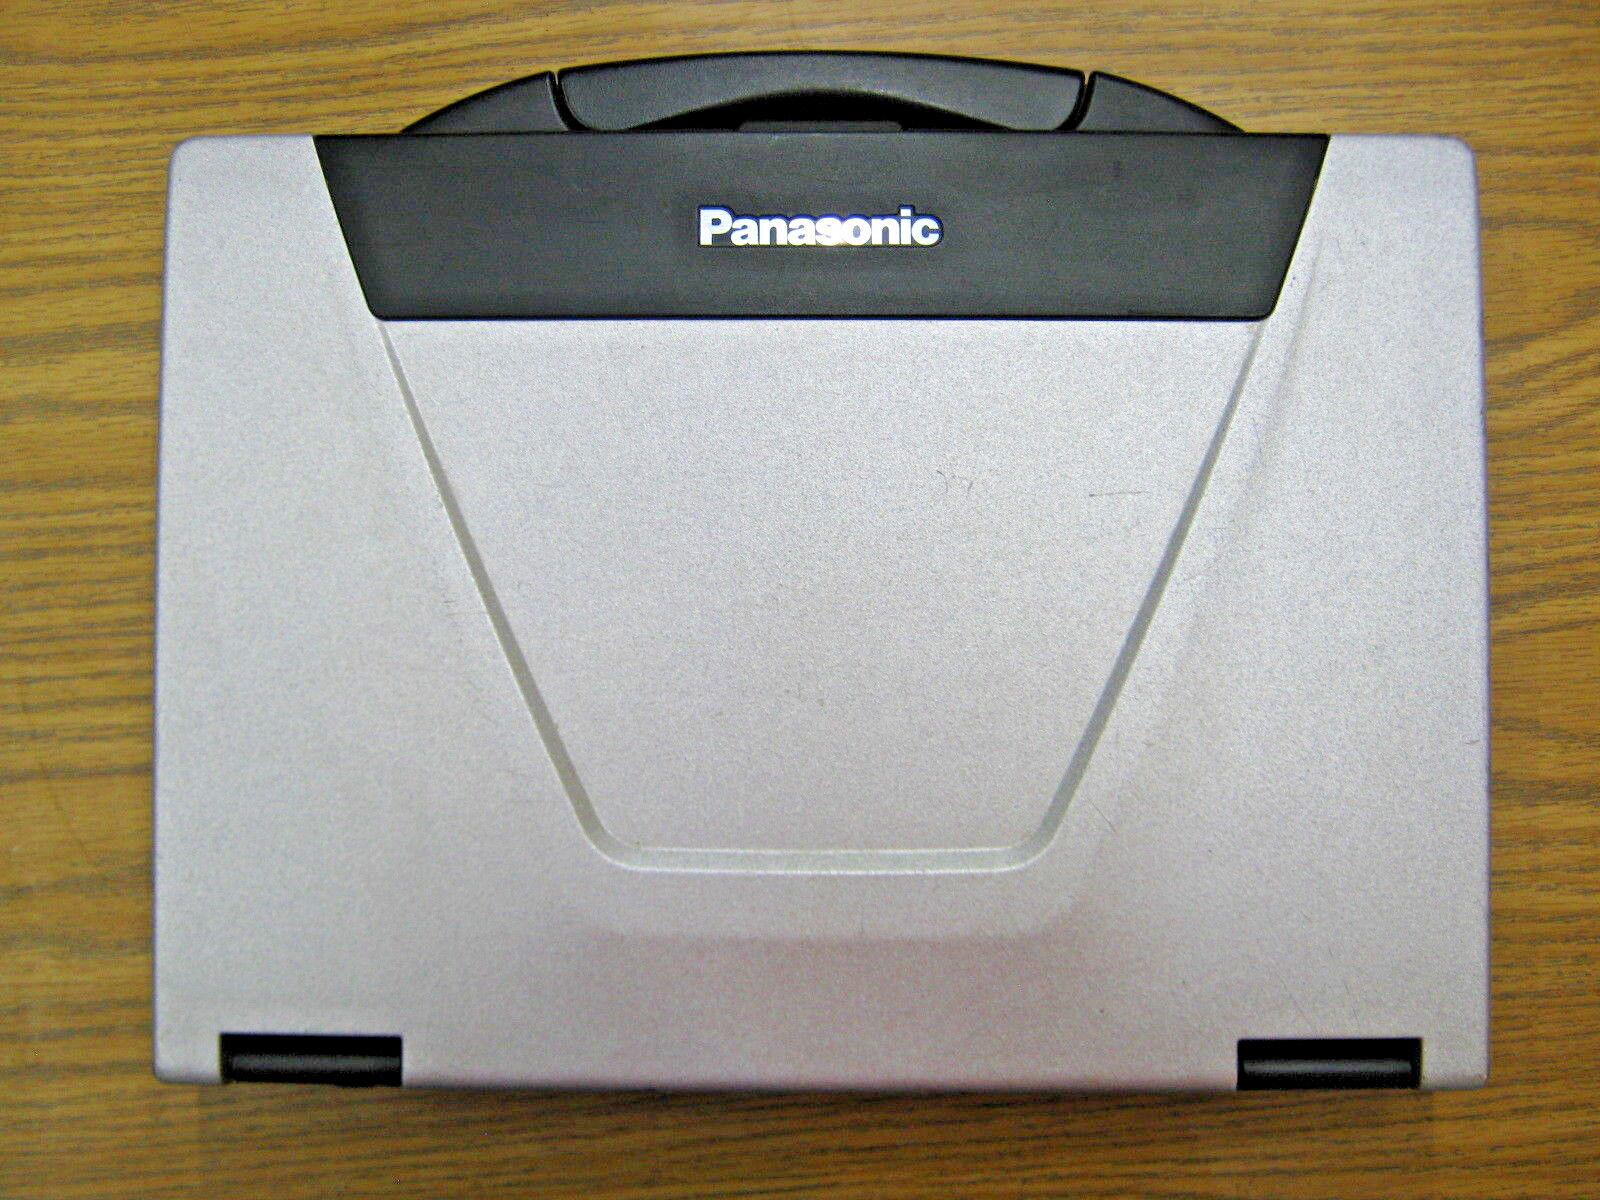 Panasonic Toughbook  CF-52  2.40GHz,  320GB, ATI GRAPHICS, DVD, WIN 7,  Complete